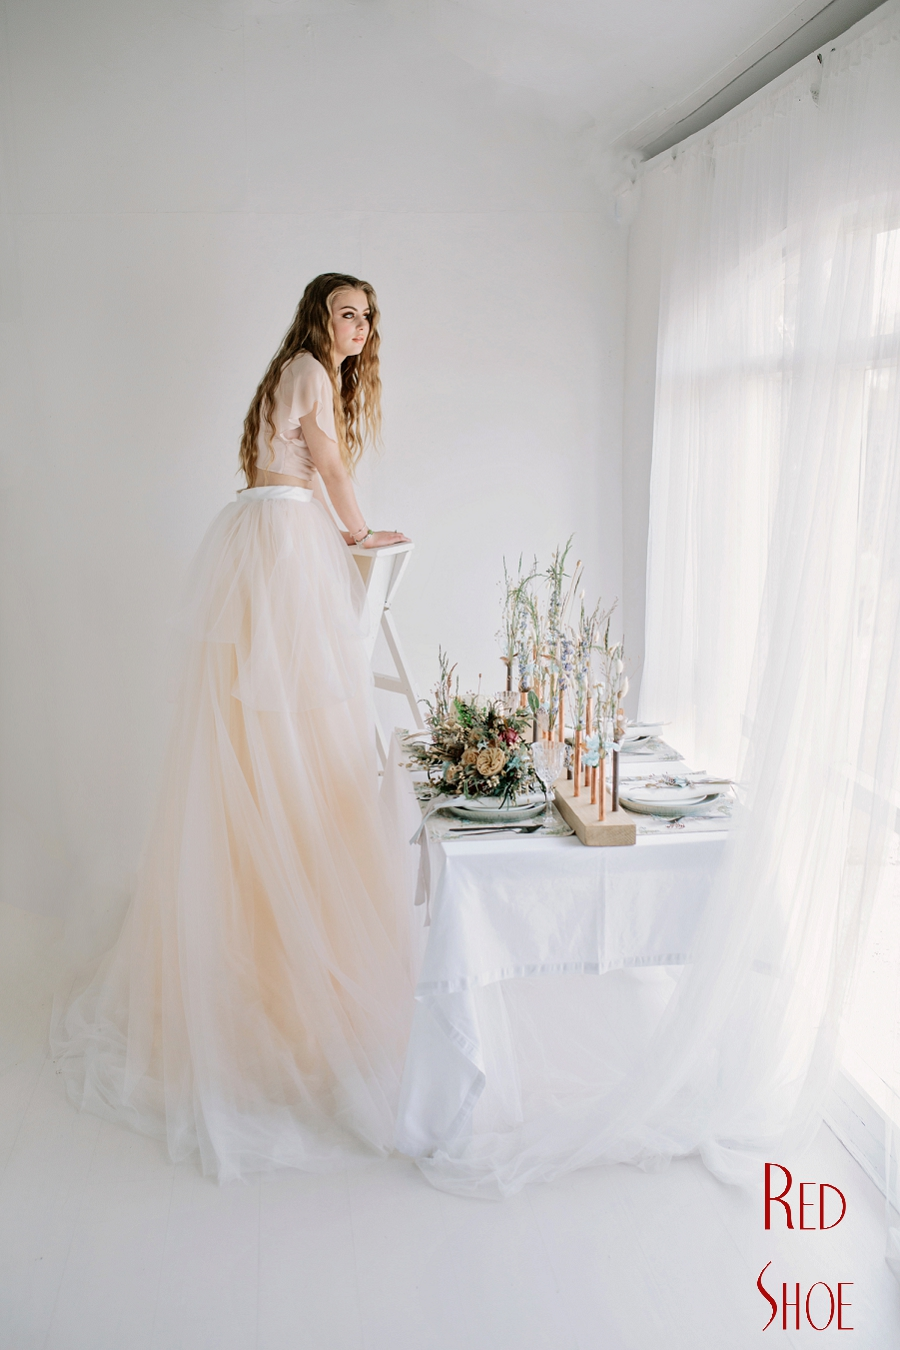 Boho bride, Glam Boho bride, Wedding inspiration, Styled wedding photo shoot, wedding ideas, wedding flower ideas, wedding photography, dried wedding flowers, boho bride makeup ideas_0056.jpg